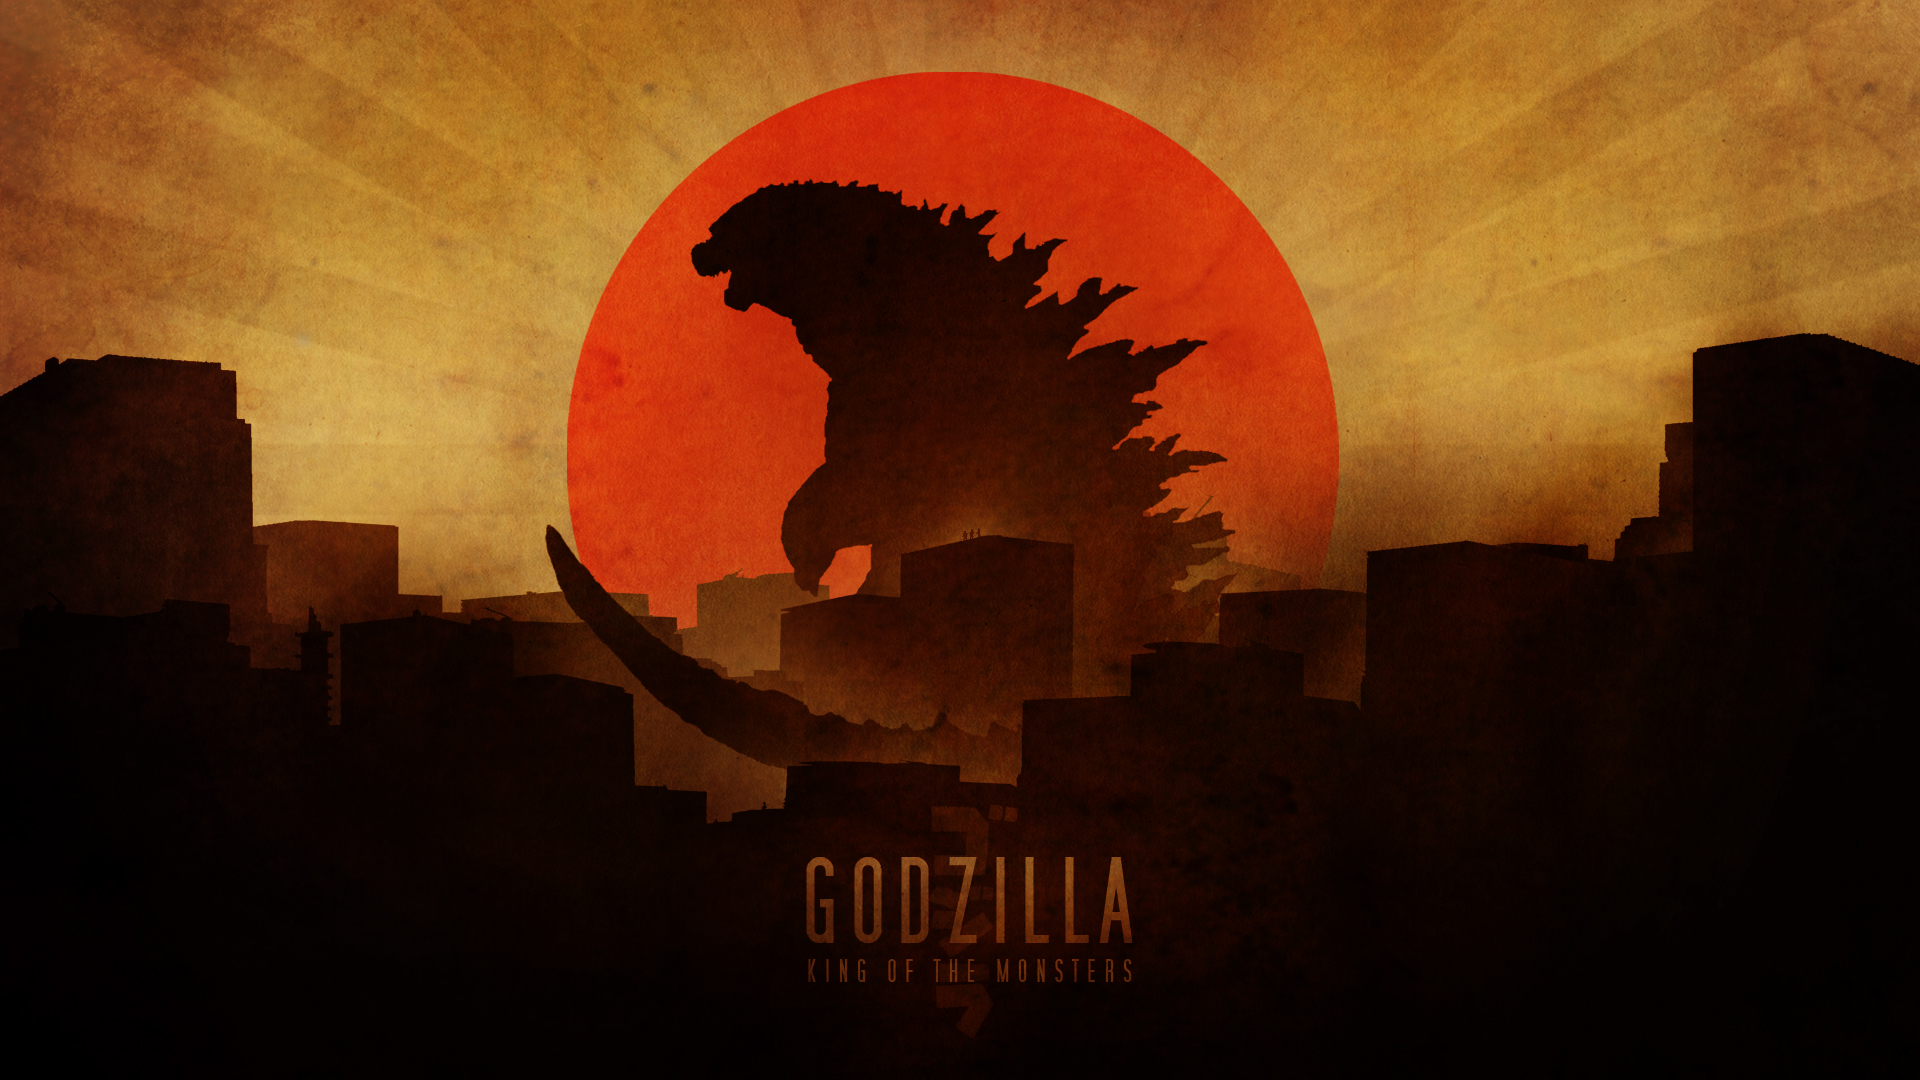 Godzilla wallpaper by RockLou on DeviantArt